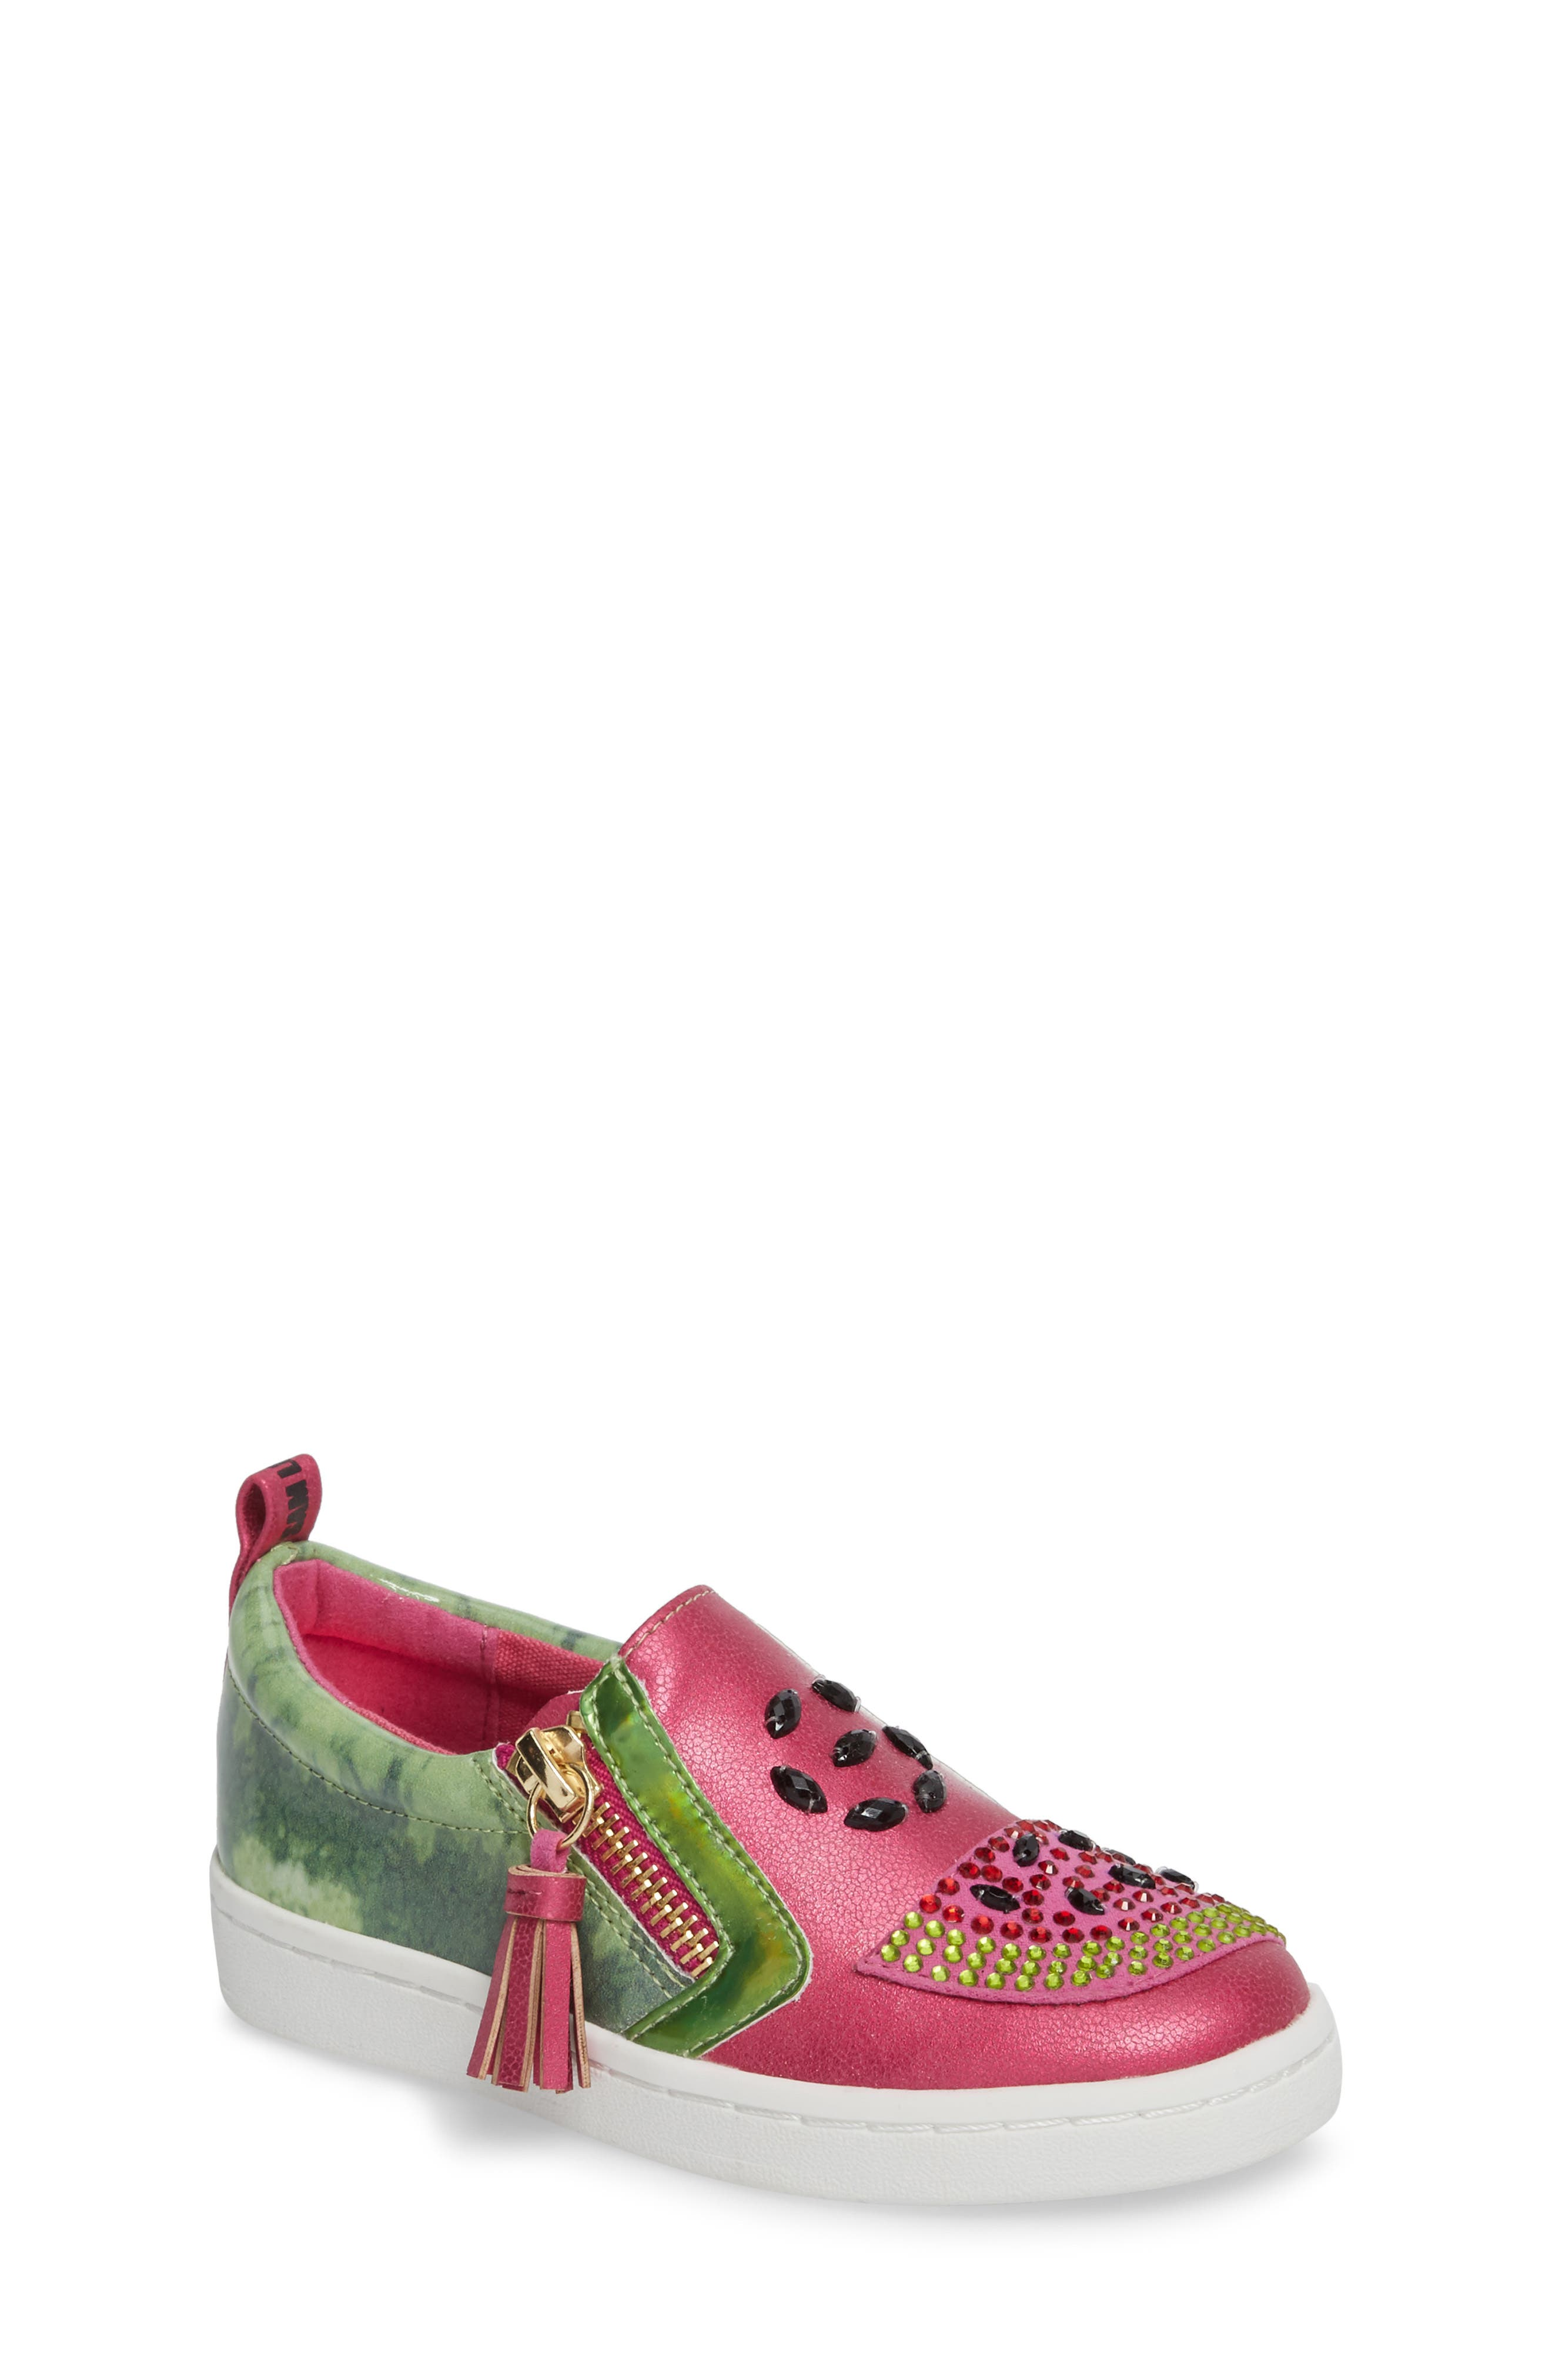 Blane Watermelon Sneaker,                         Main,                         color, 653